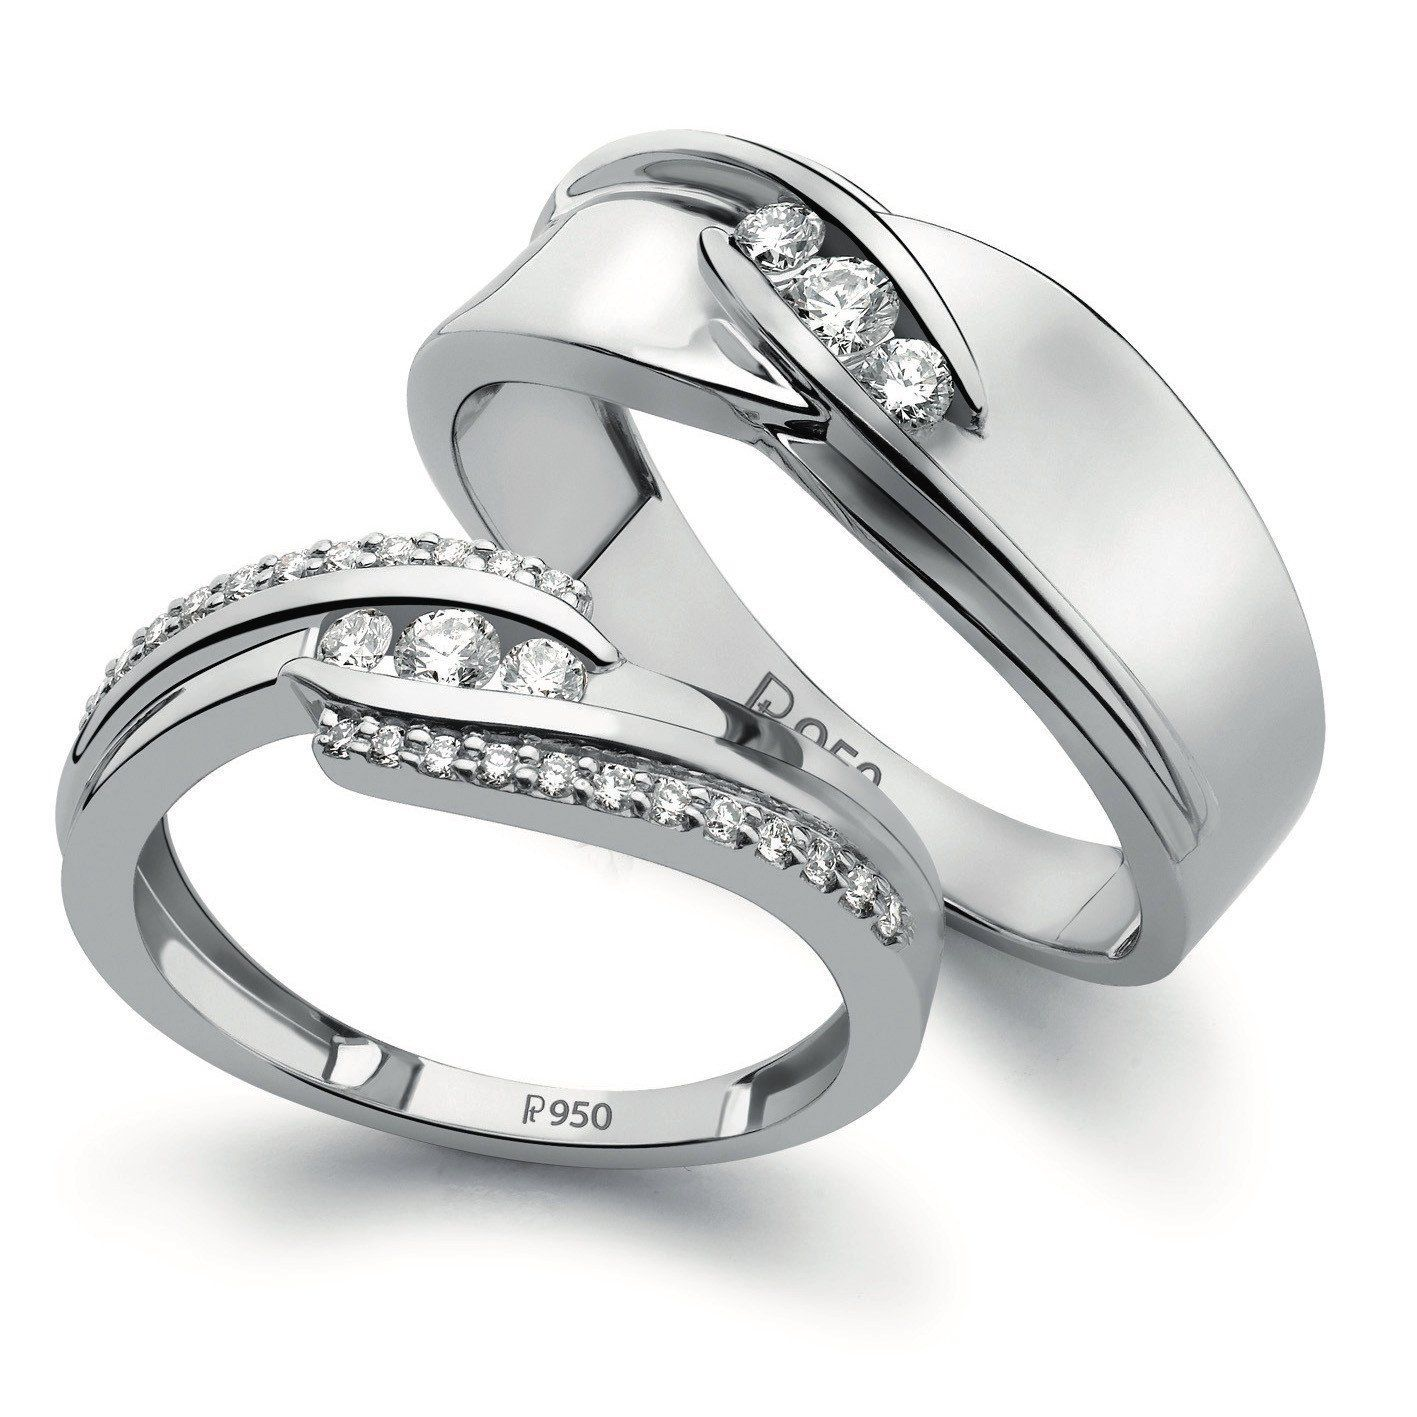 Designer Platinum Love Bands With Diamonds Sj Pto 152 Ladies Diamond Rings Couple Ring Design Rings For Men